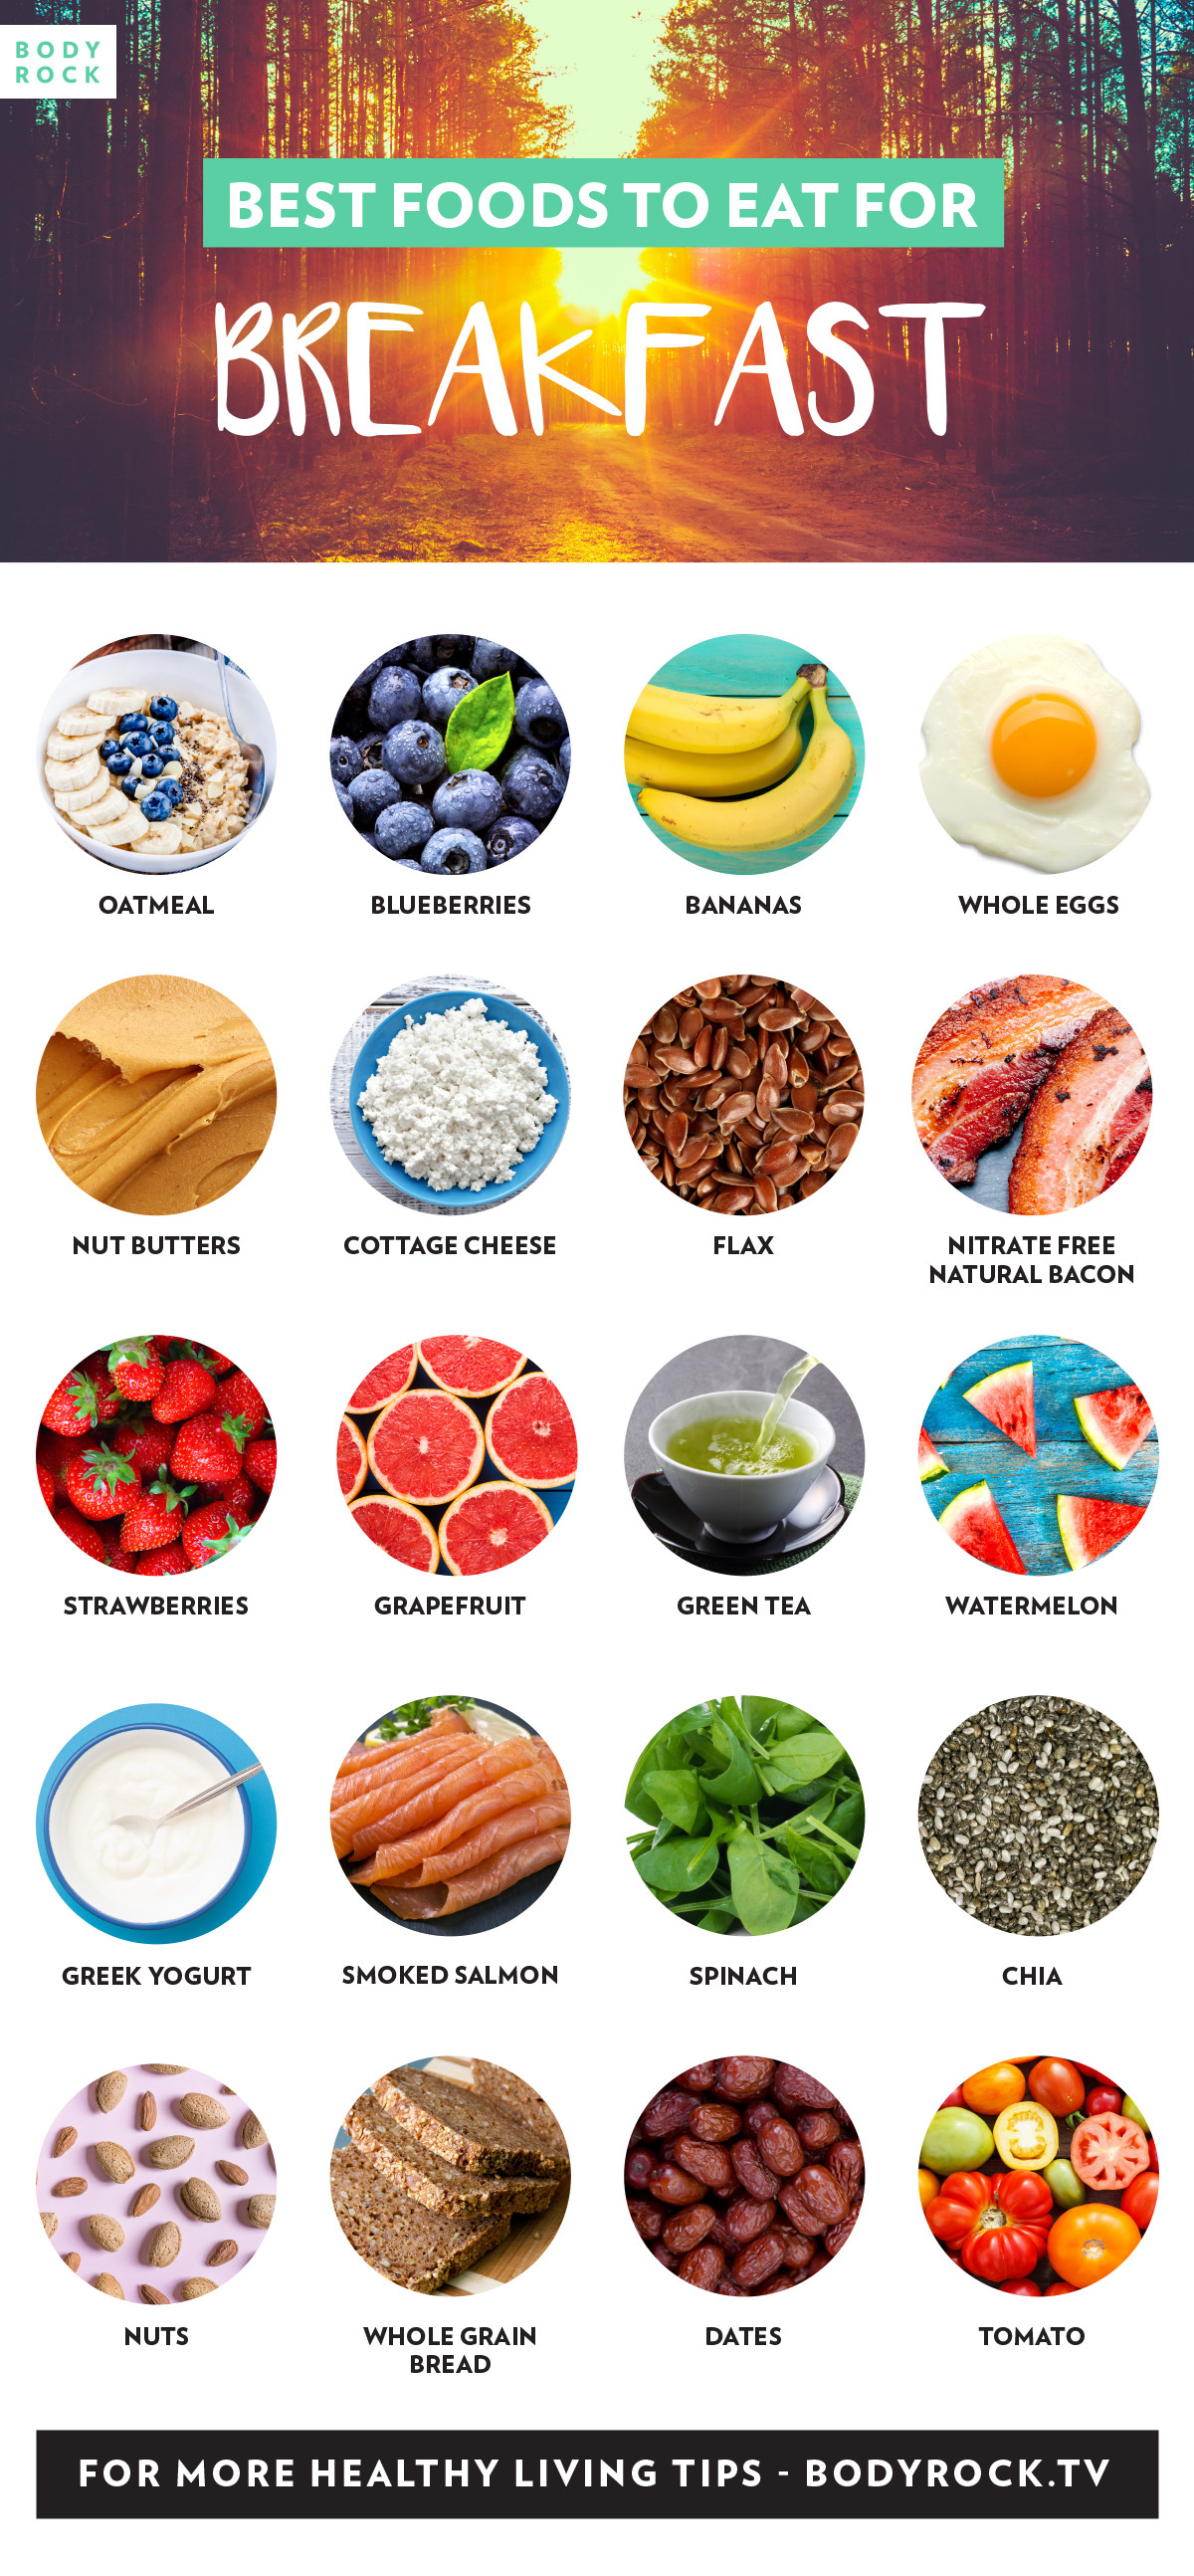 Healthy Breakfast Foods To Eat  Best Foods To Eat For Breakfast